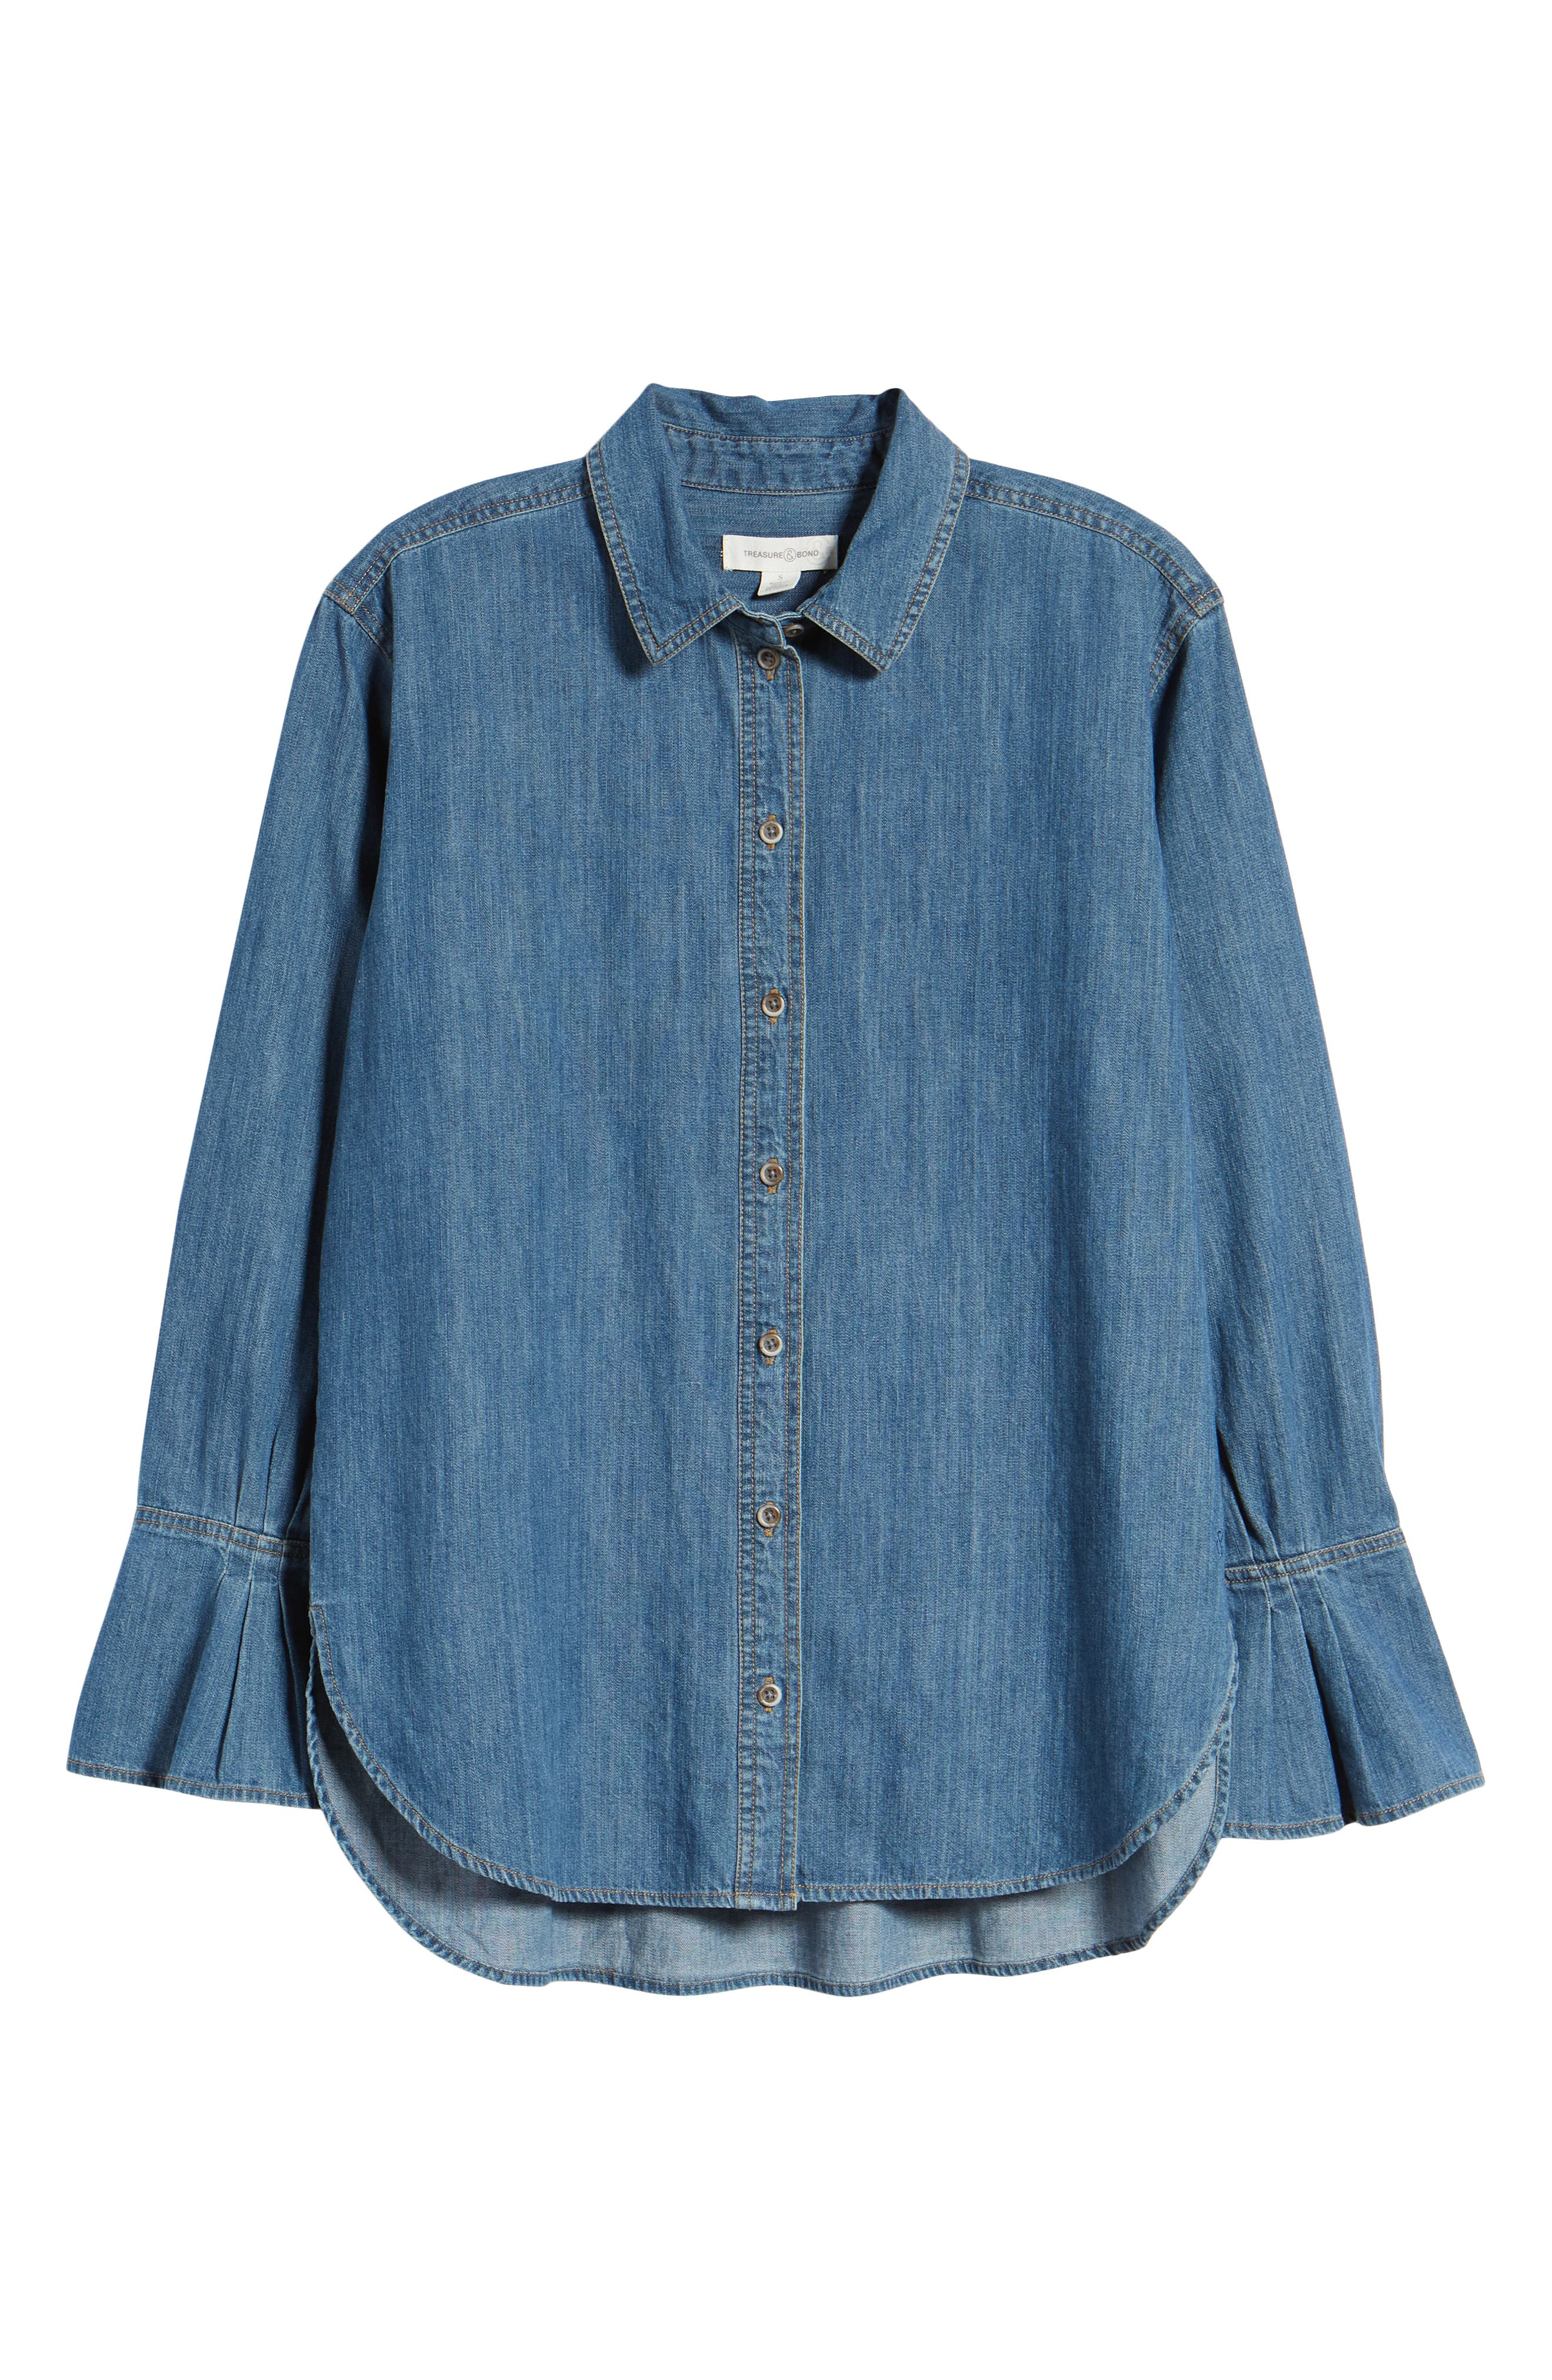 TREASURE & BOND,                             Pleated Cuff Chambray Shirt,                             Alternate thumbnail 6, color,                             420